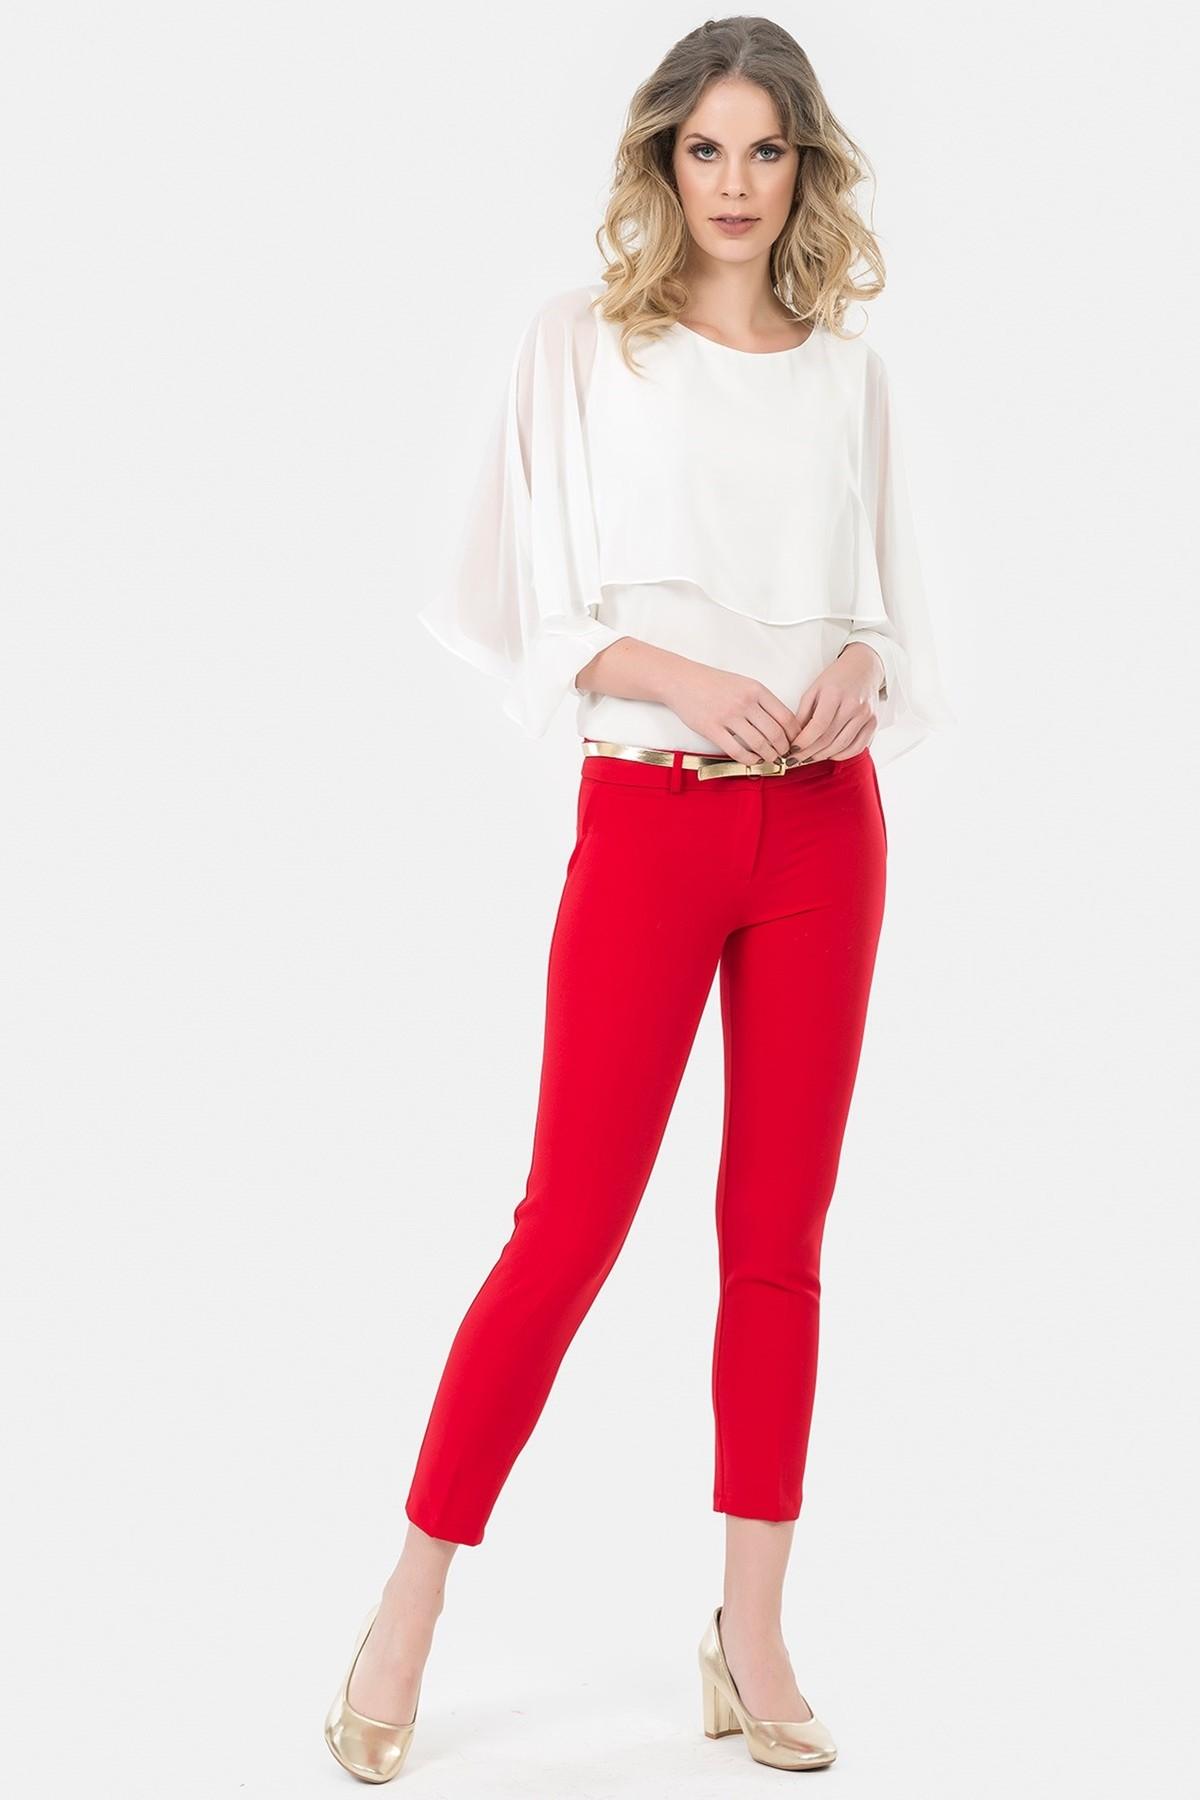 İroni Kadın Kırmızı Kemerli Dar Paça Pantolon 1581-891A 1